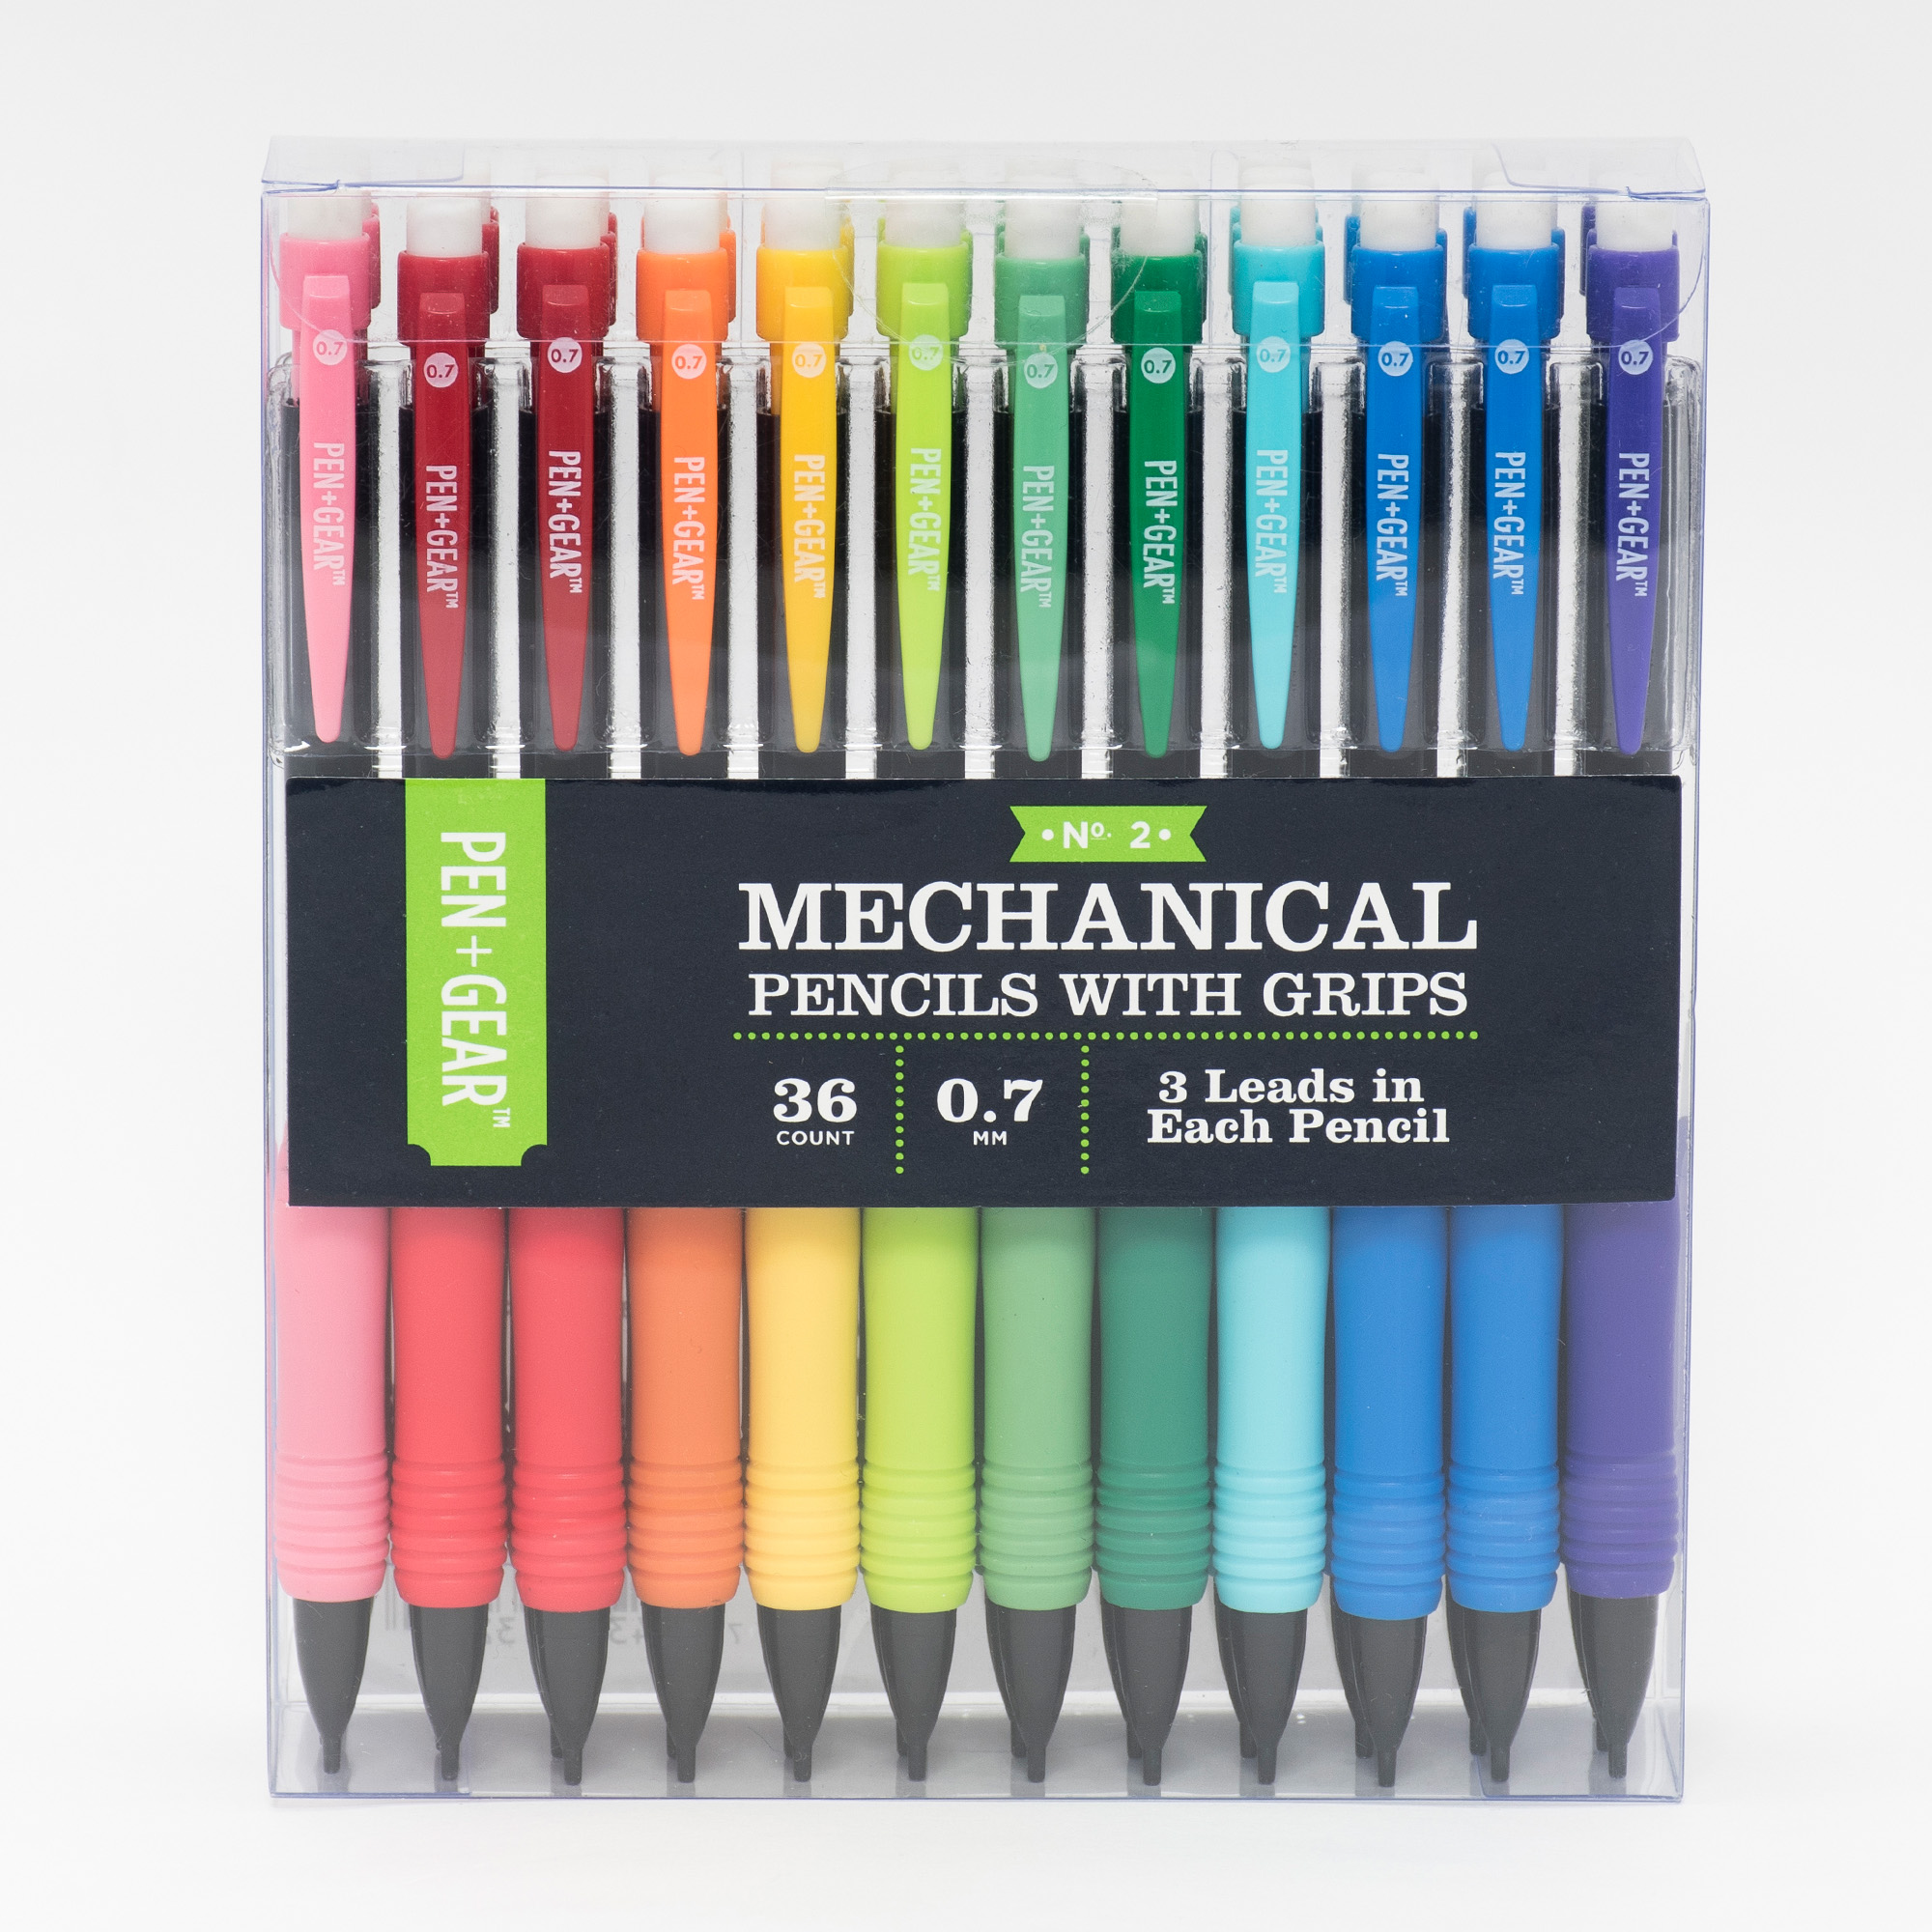 Pen + Gear 36pk Mechanical Pencils with Grips, 0.7mm